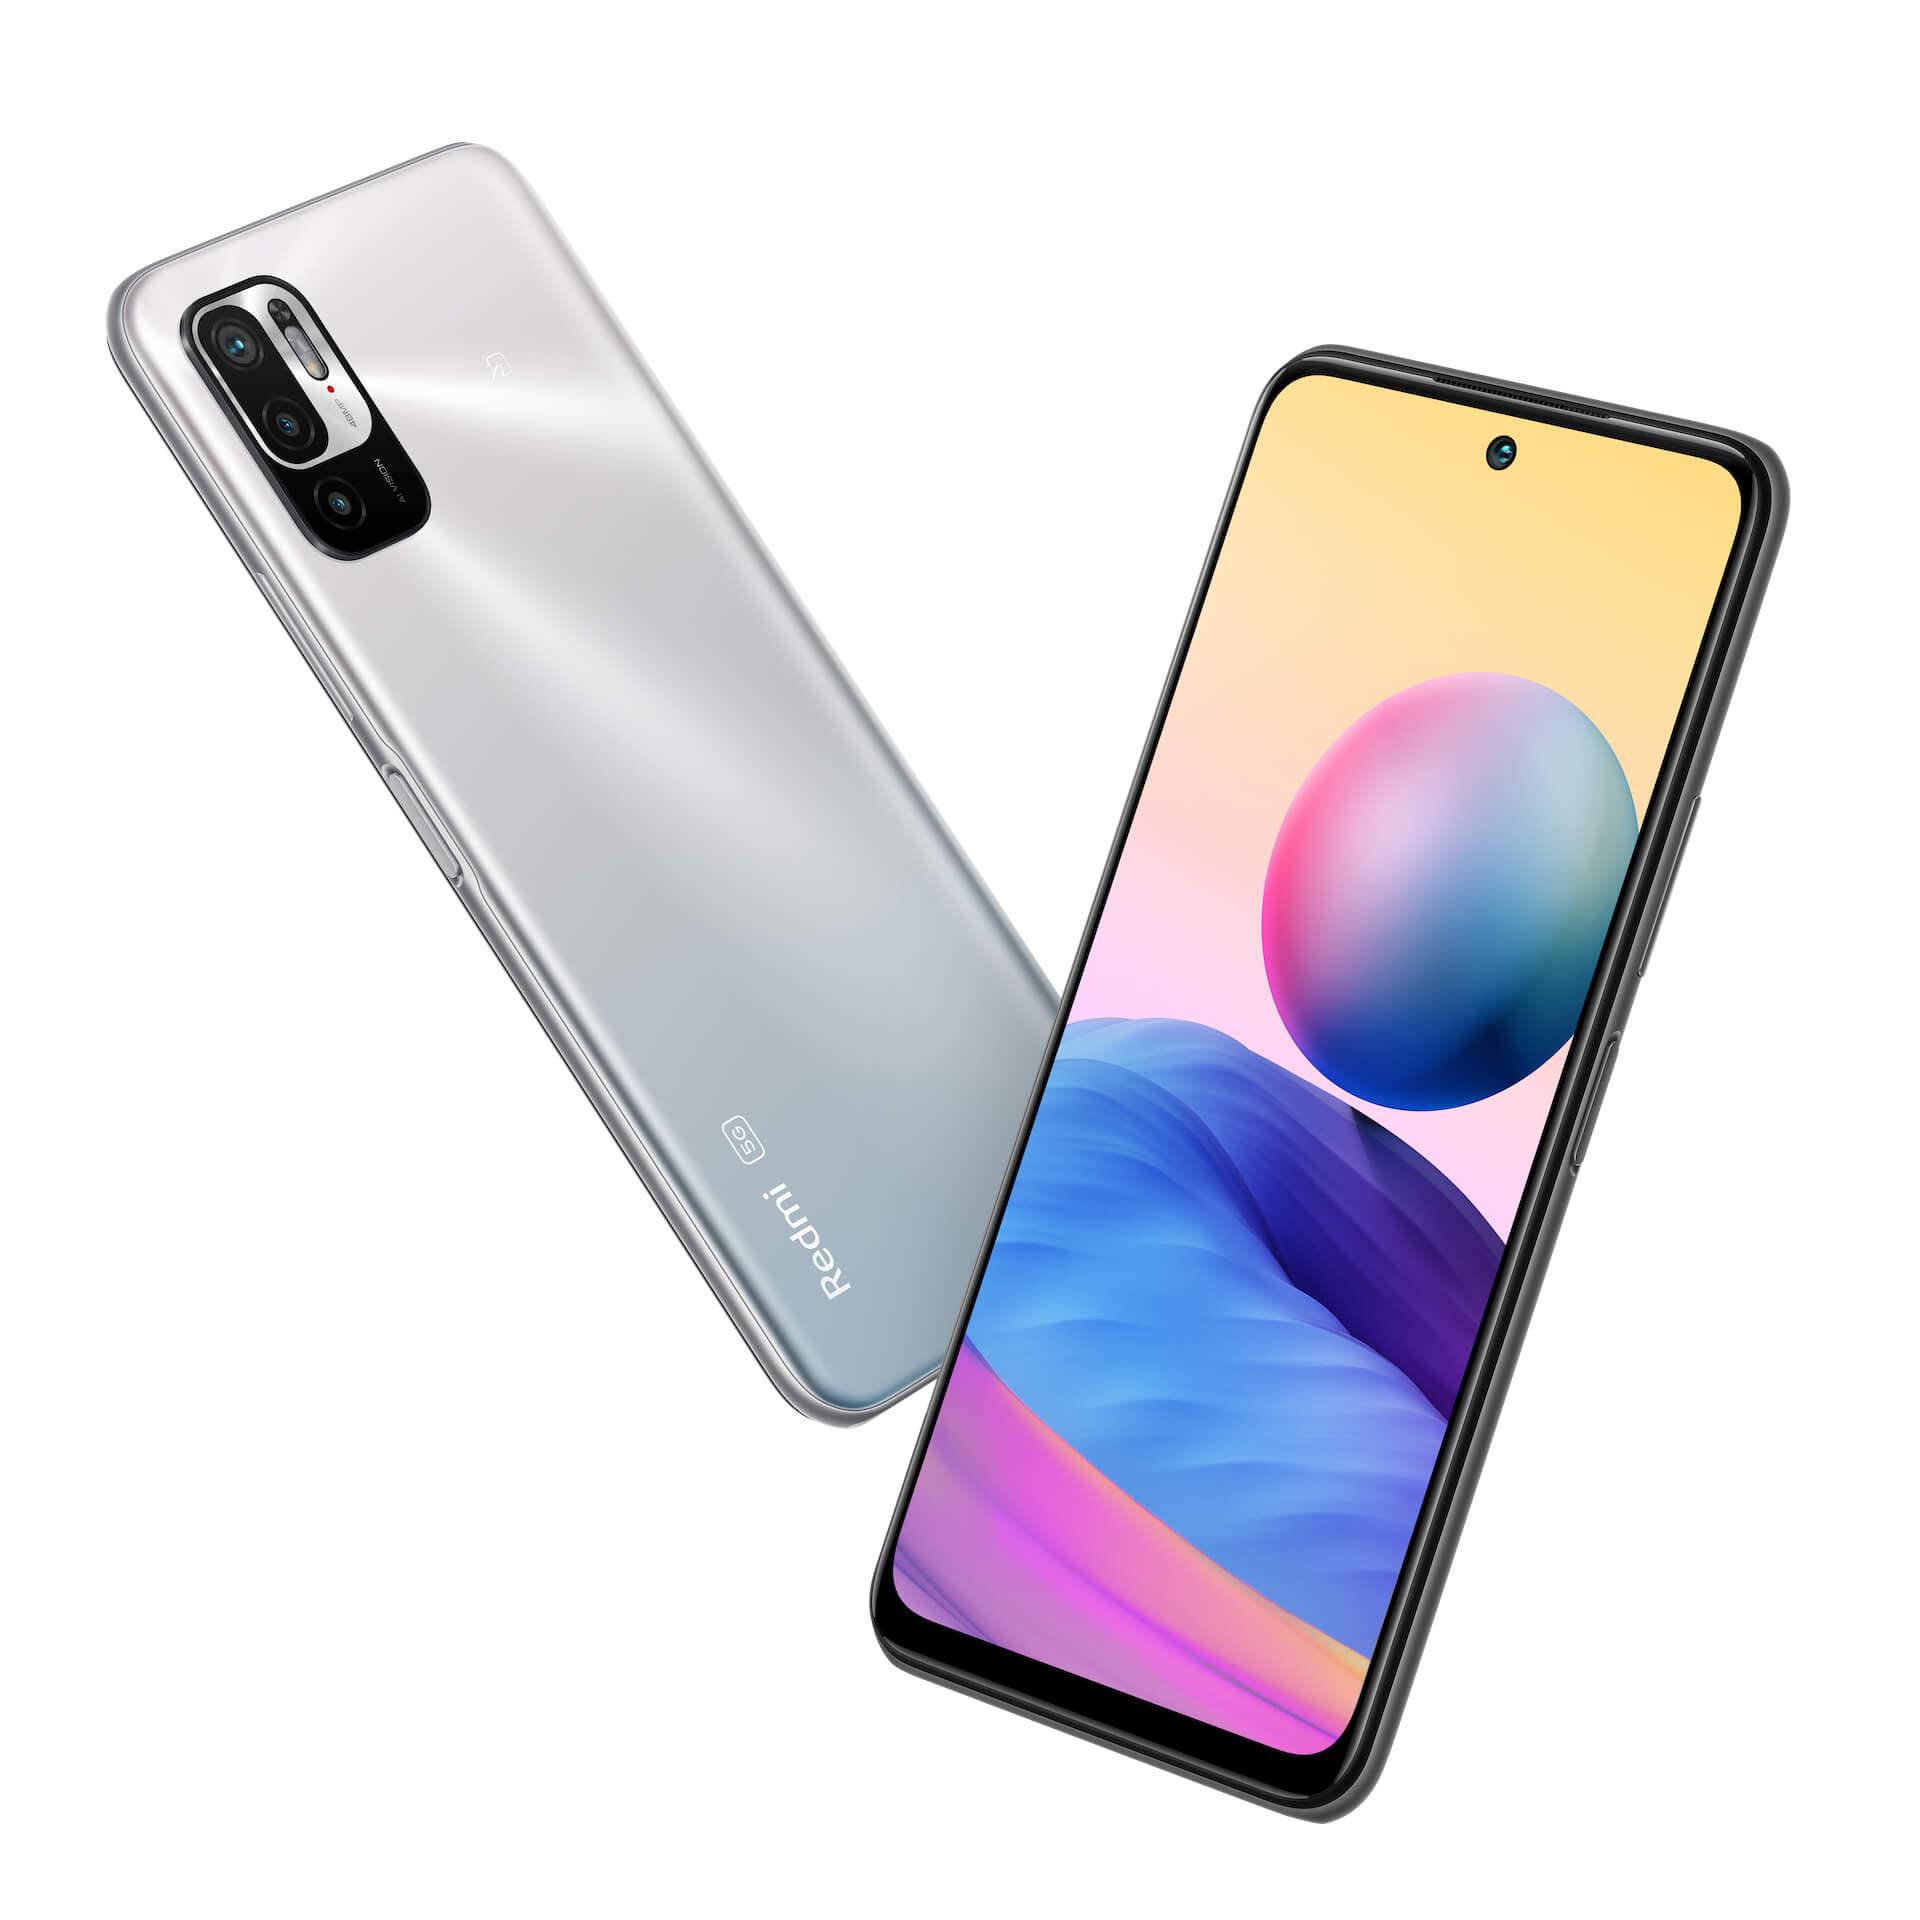 Xiaomiから初の日本独自モデルの5Gスマホ『Redmi Note 10 JE』が発売決定!AI顔認証、側面指紋認識センサーも搭載 tech210802_xiaomi_5g_5